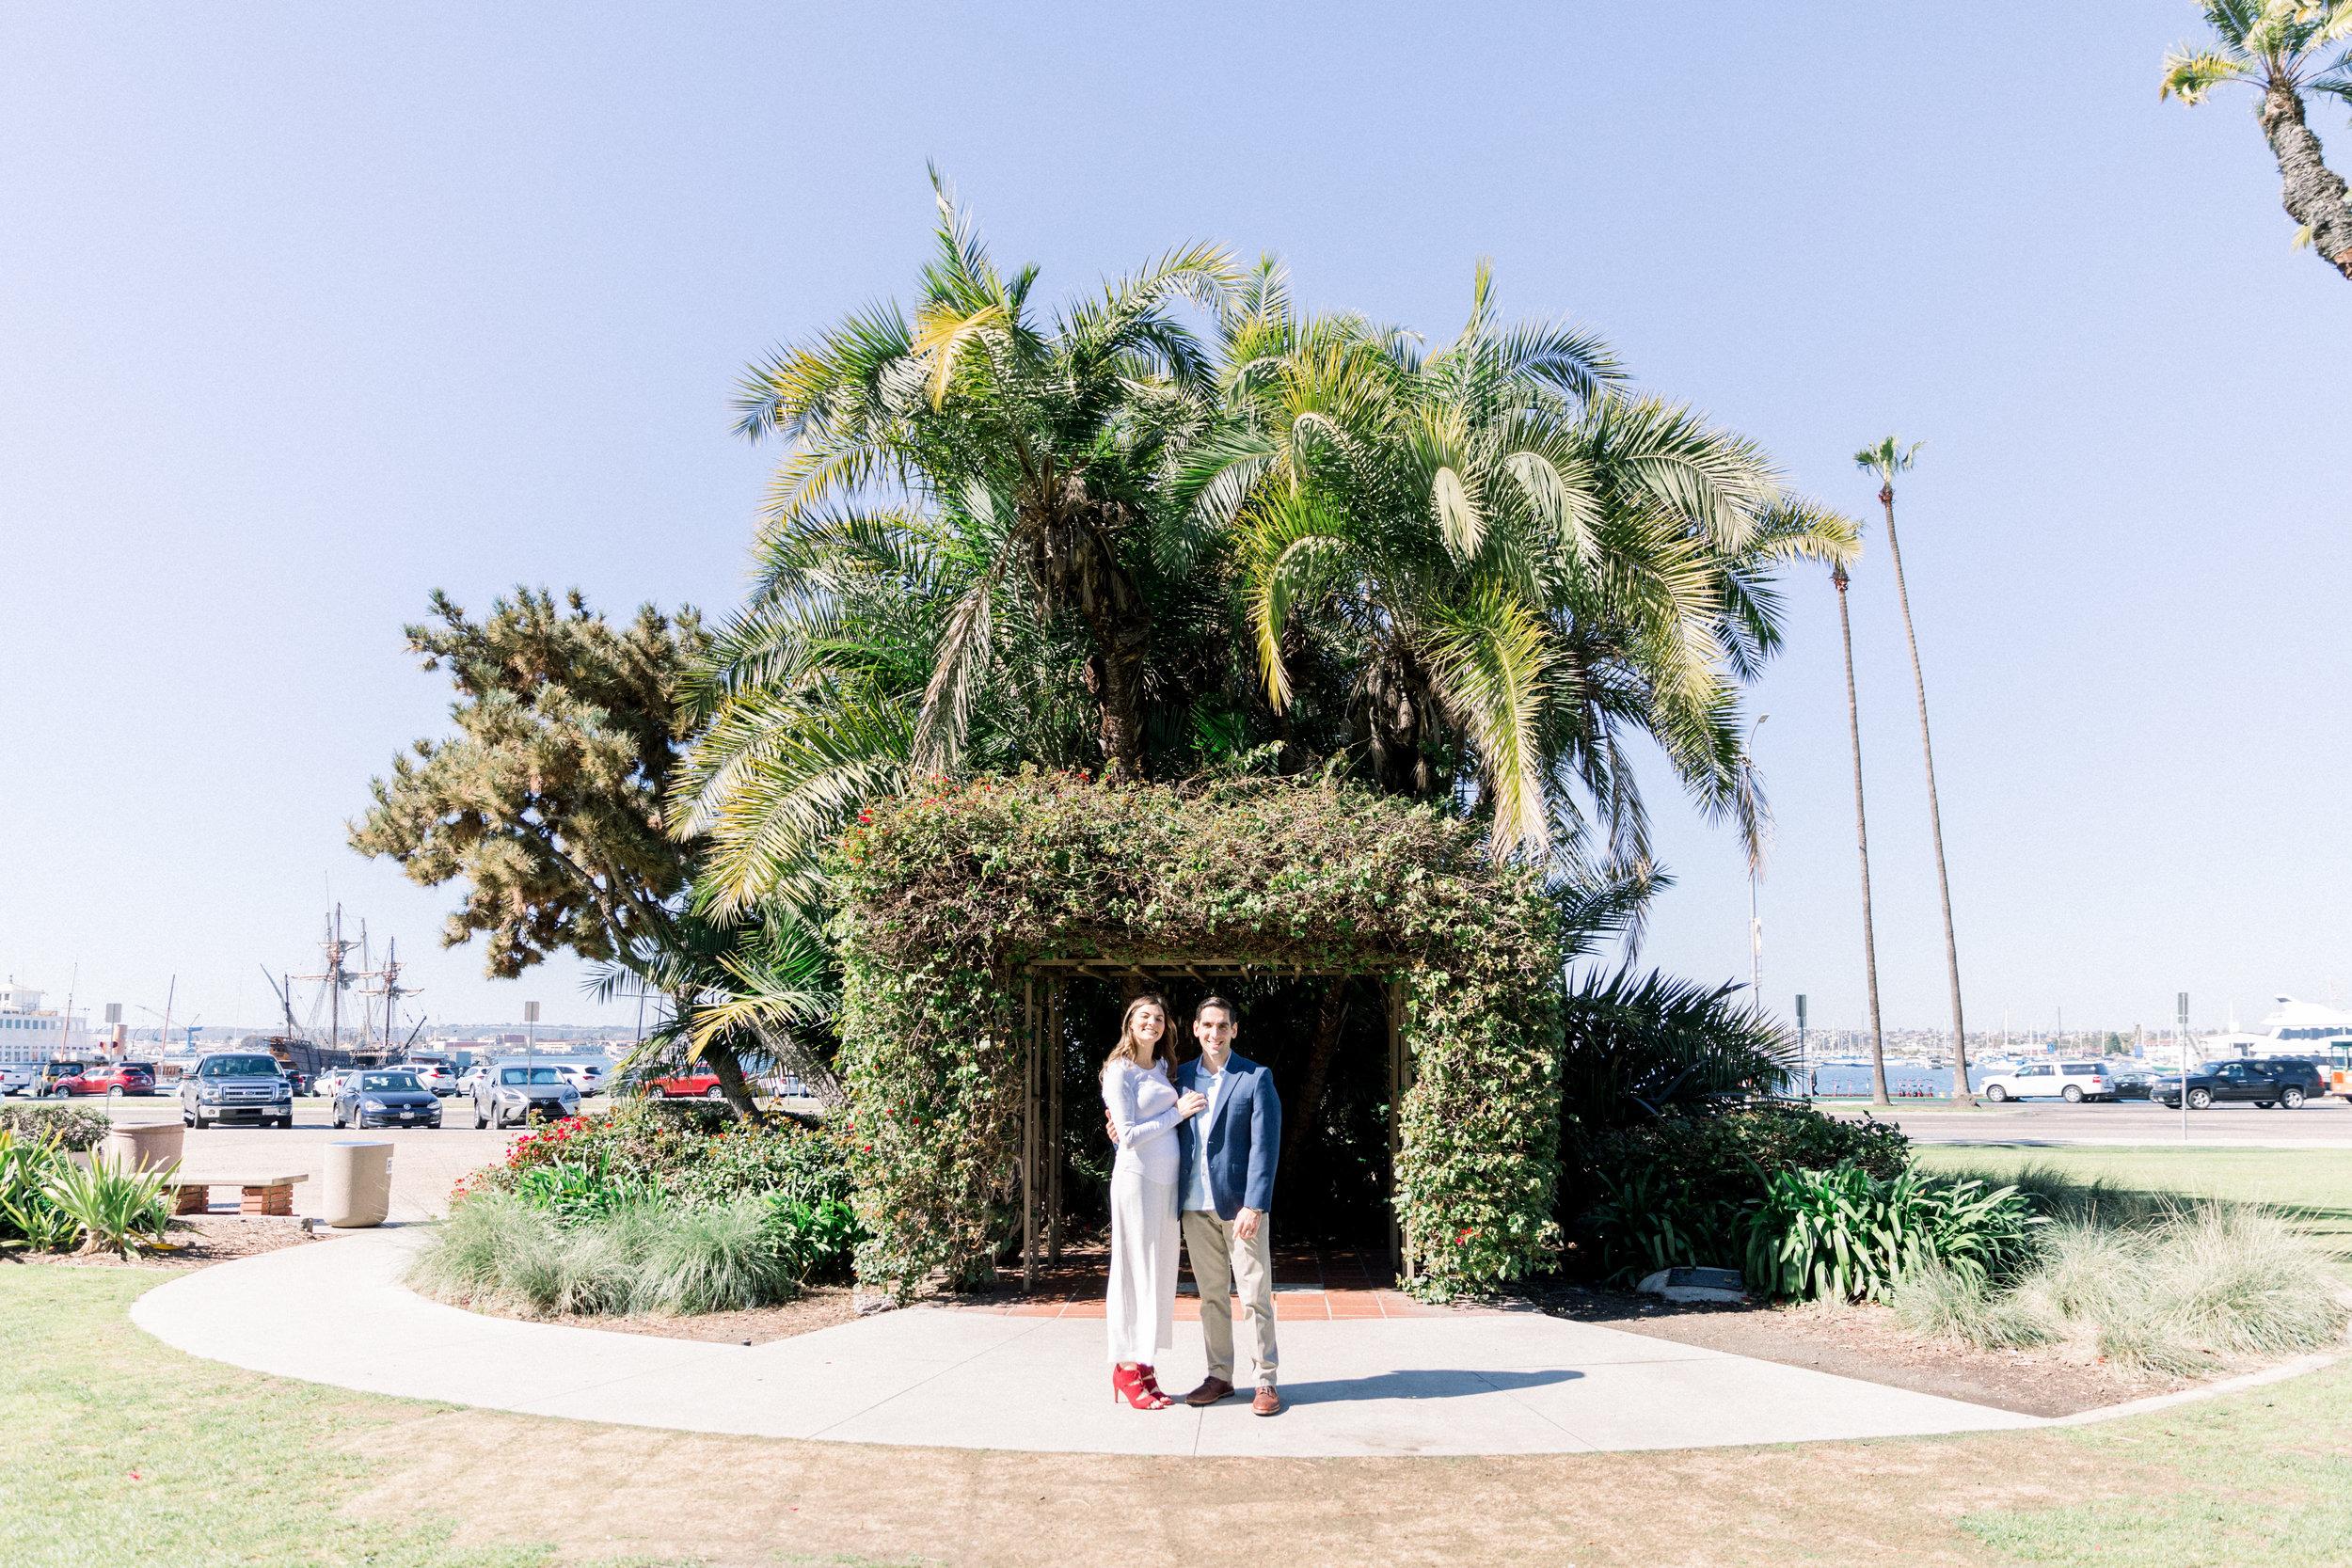 Claire_and_Dan_San_Diego_Administration_Building_Elopement_Alyssa_Boynton_Photography-13.jpg